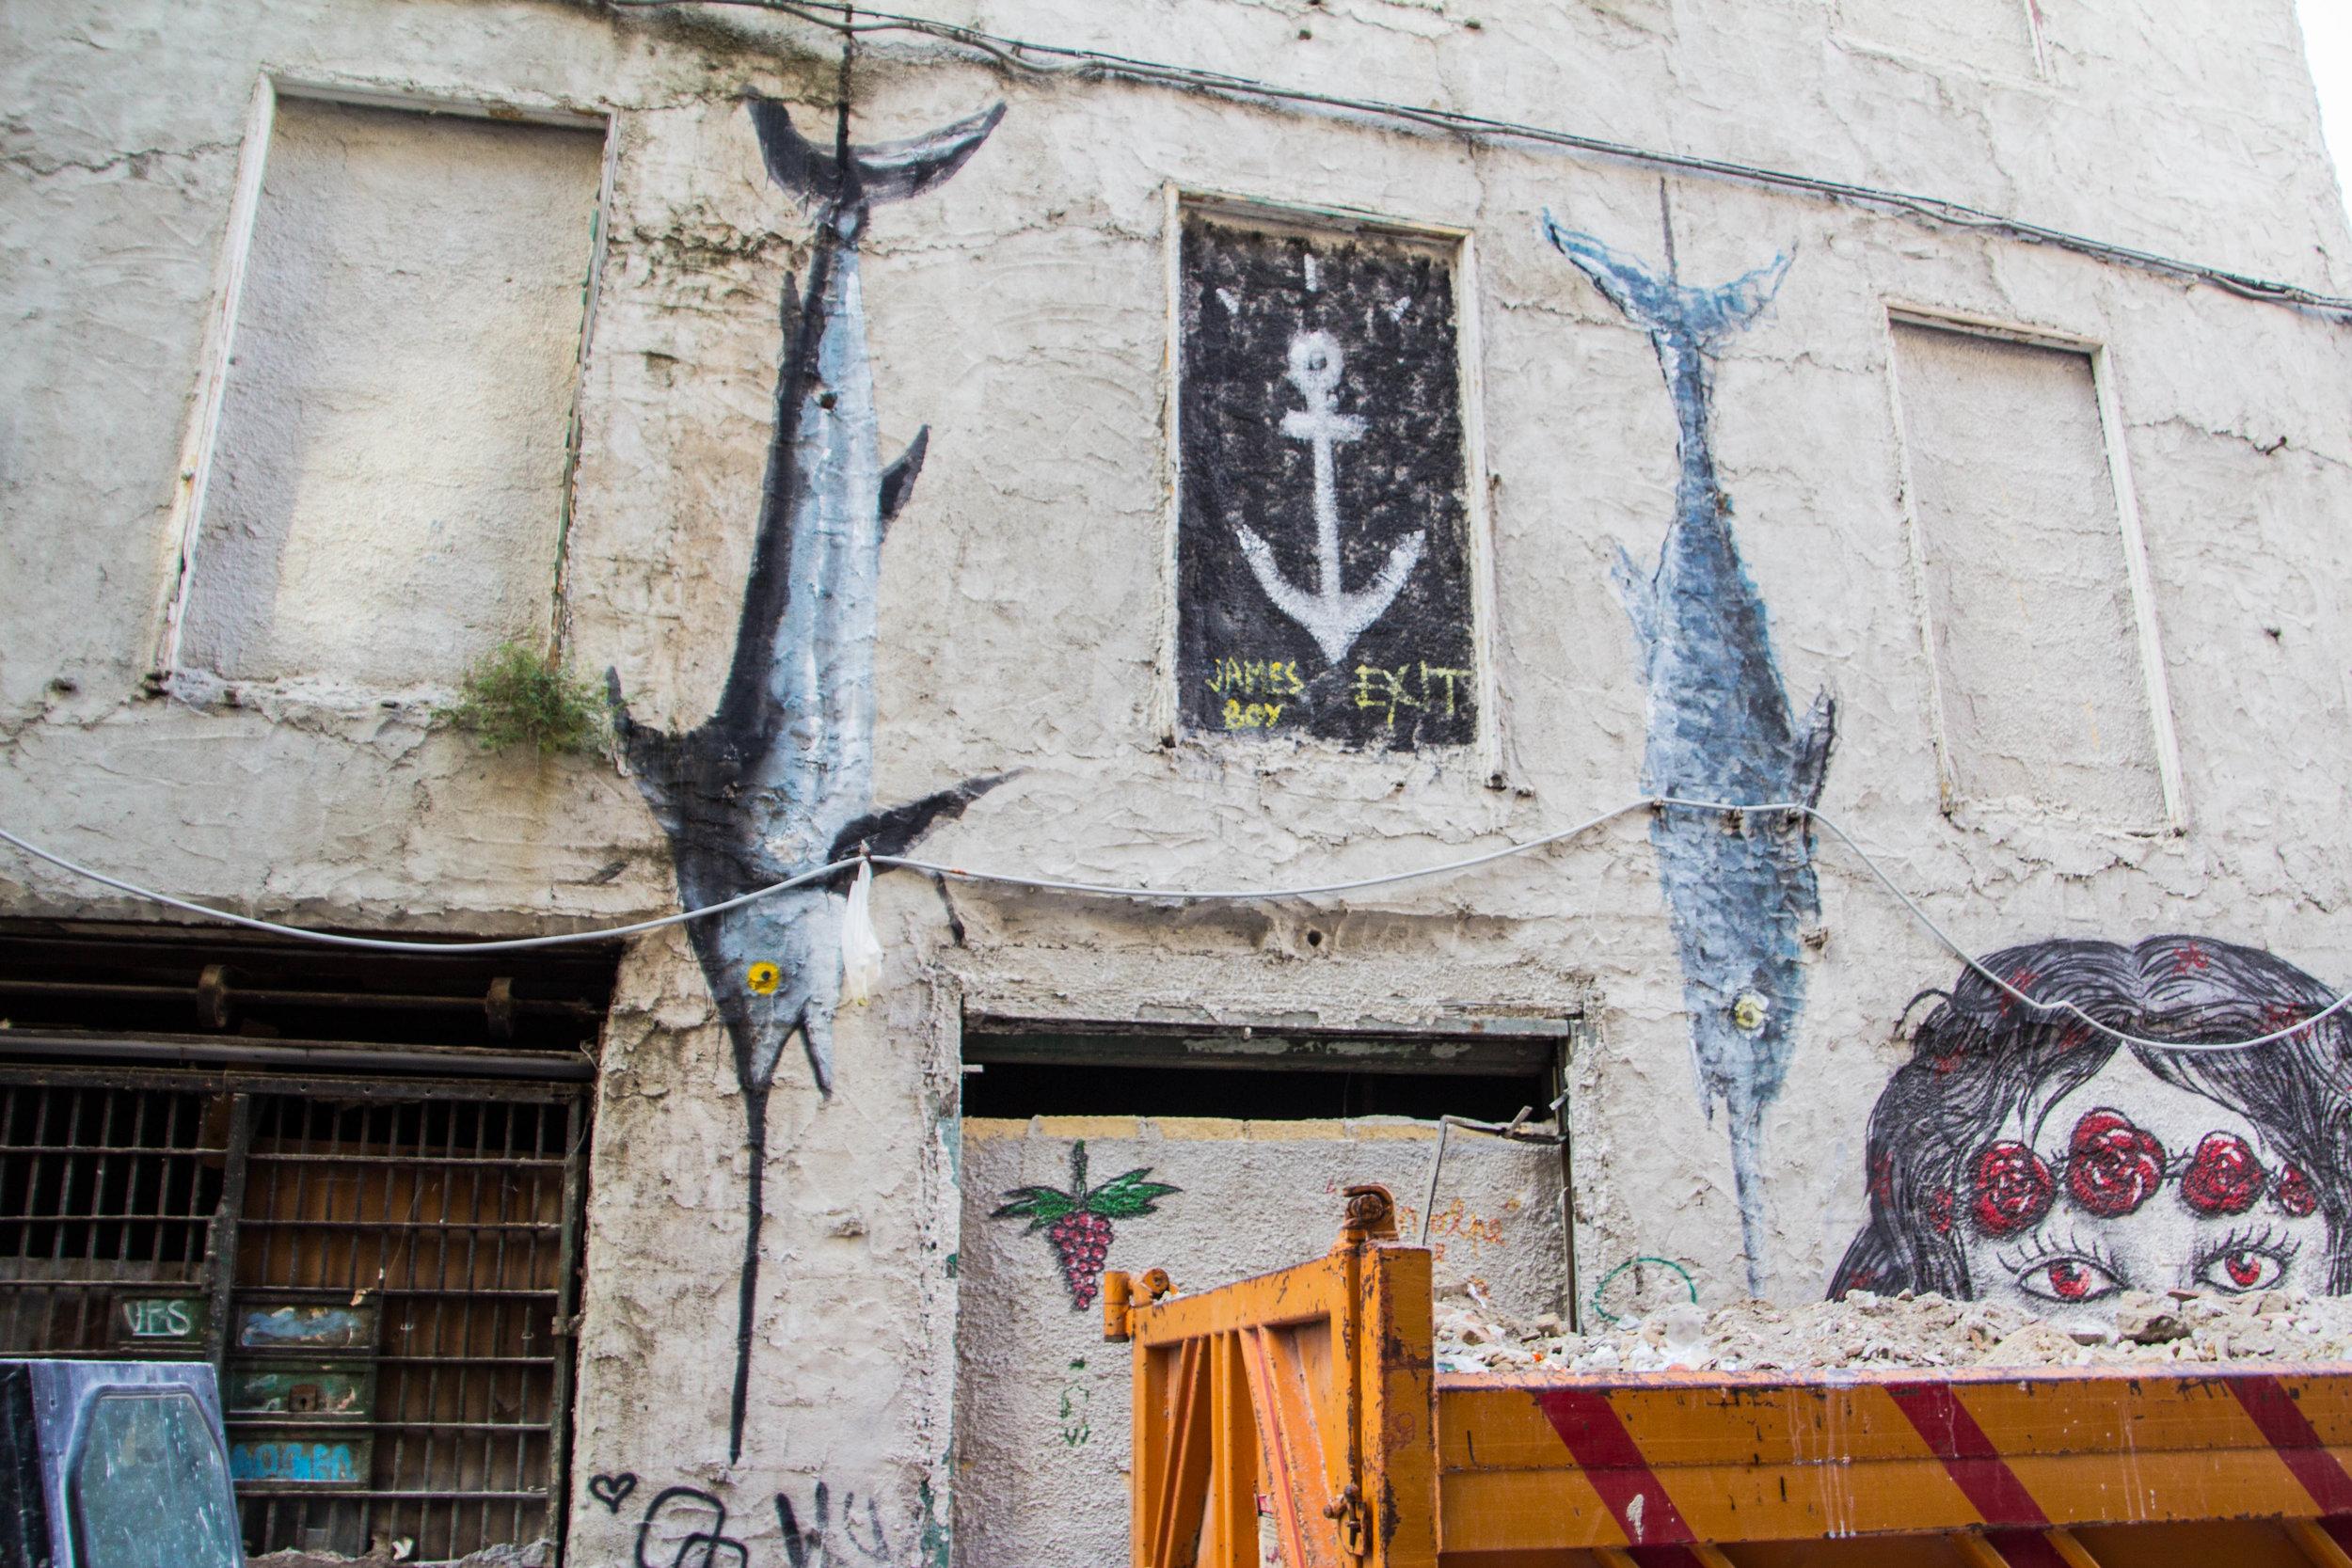 street-art-palermo-sicily-41.jpg